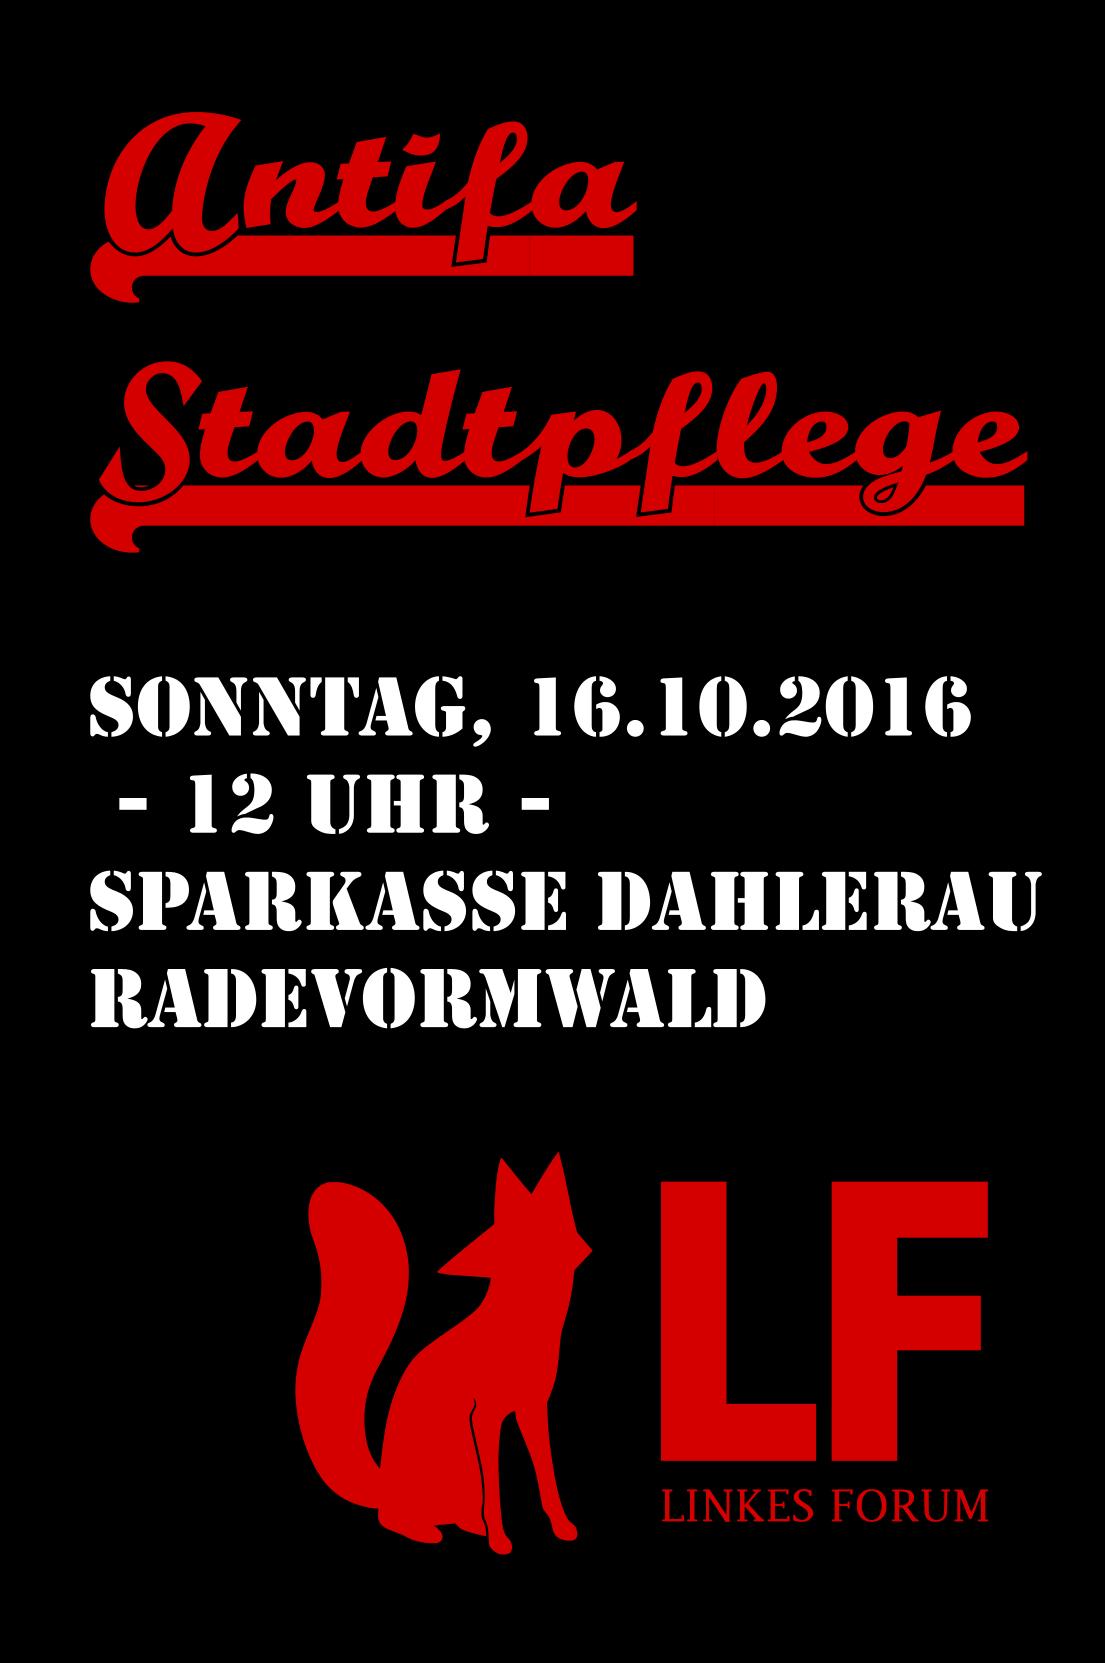 stadtpflege-aktion_16-10-16